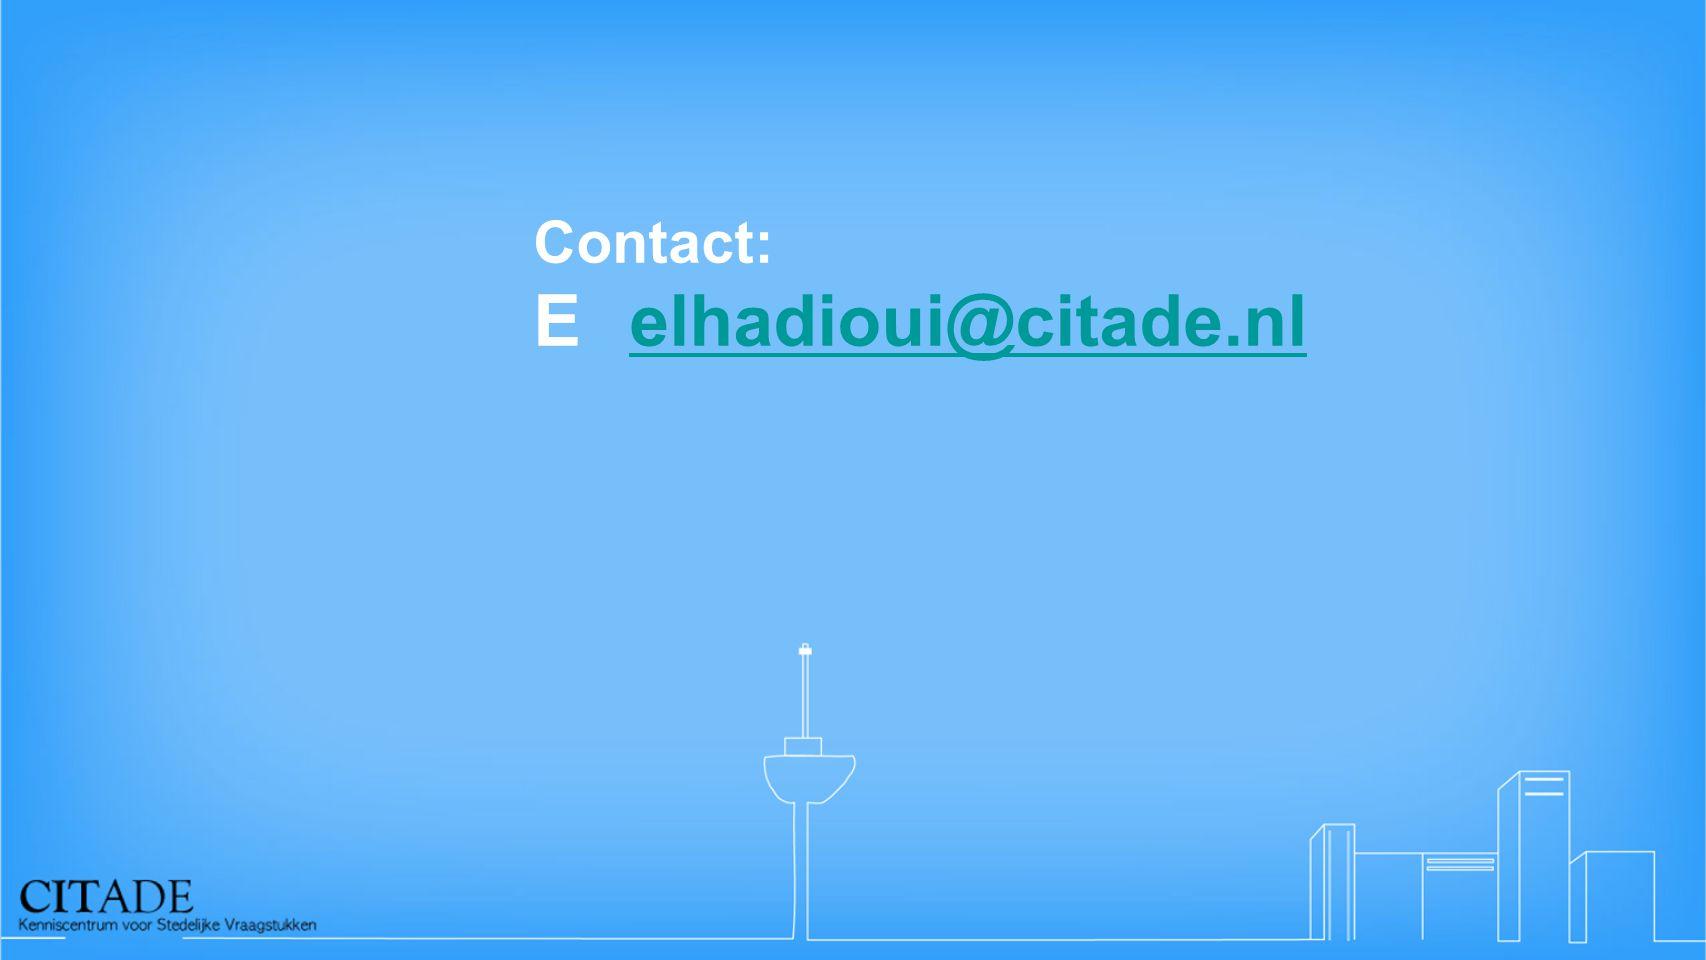 Contact: Eelhadioui@citade.nlelhadioui@citade.nl